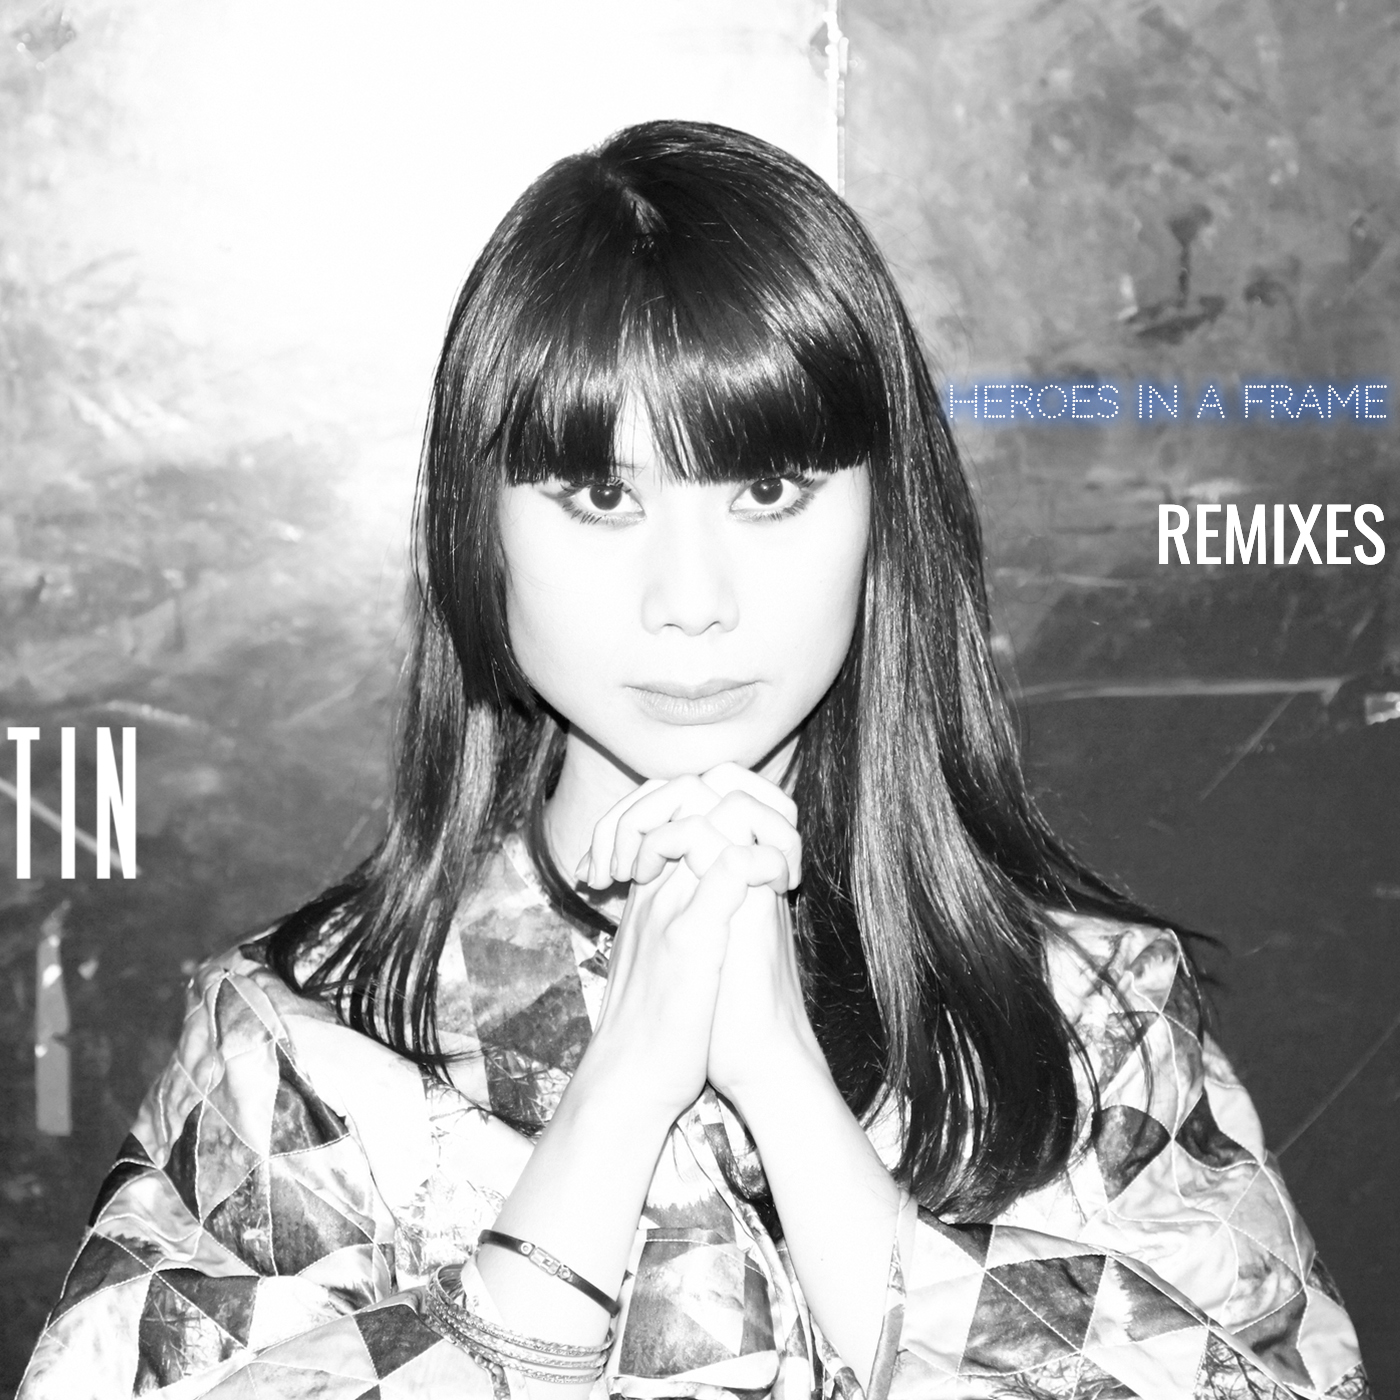 TIN se fait remixer sur son EP Heroes In A Frame